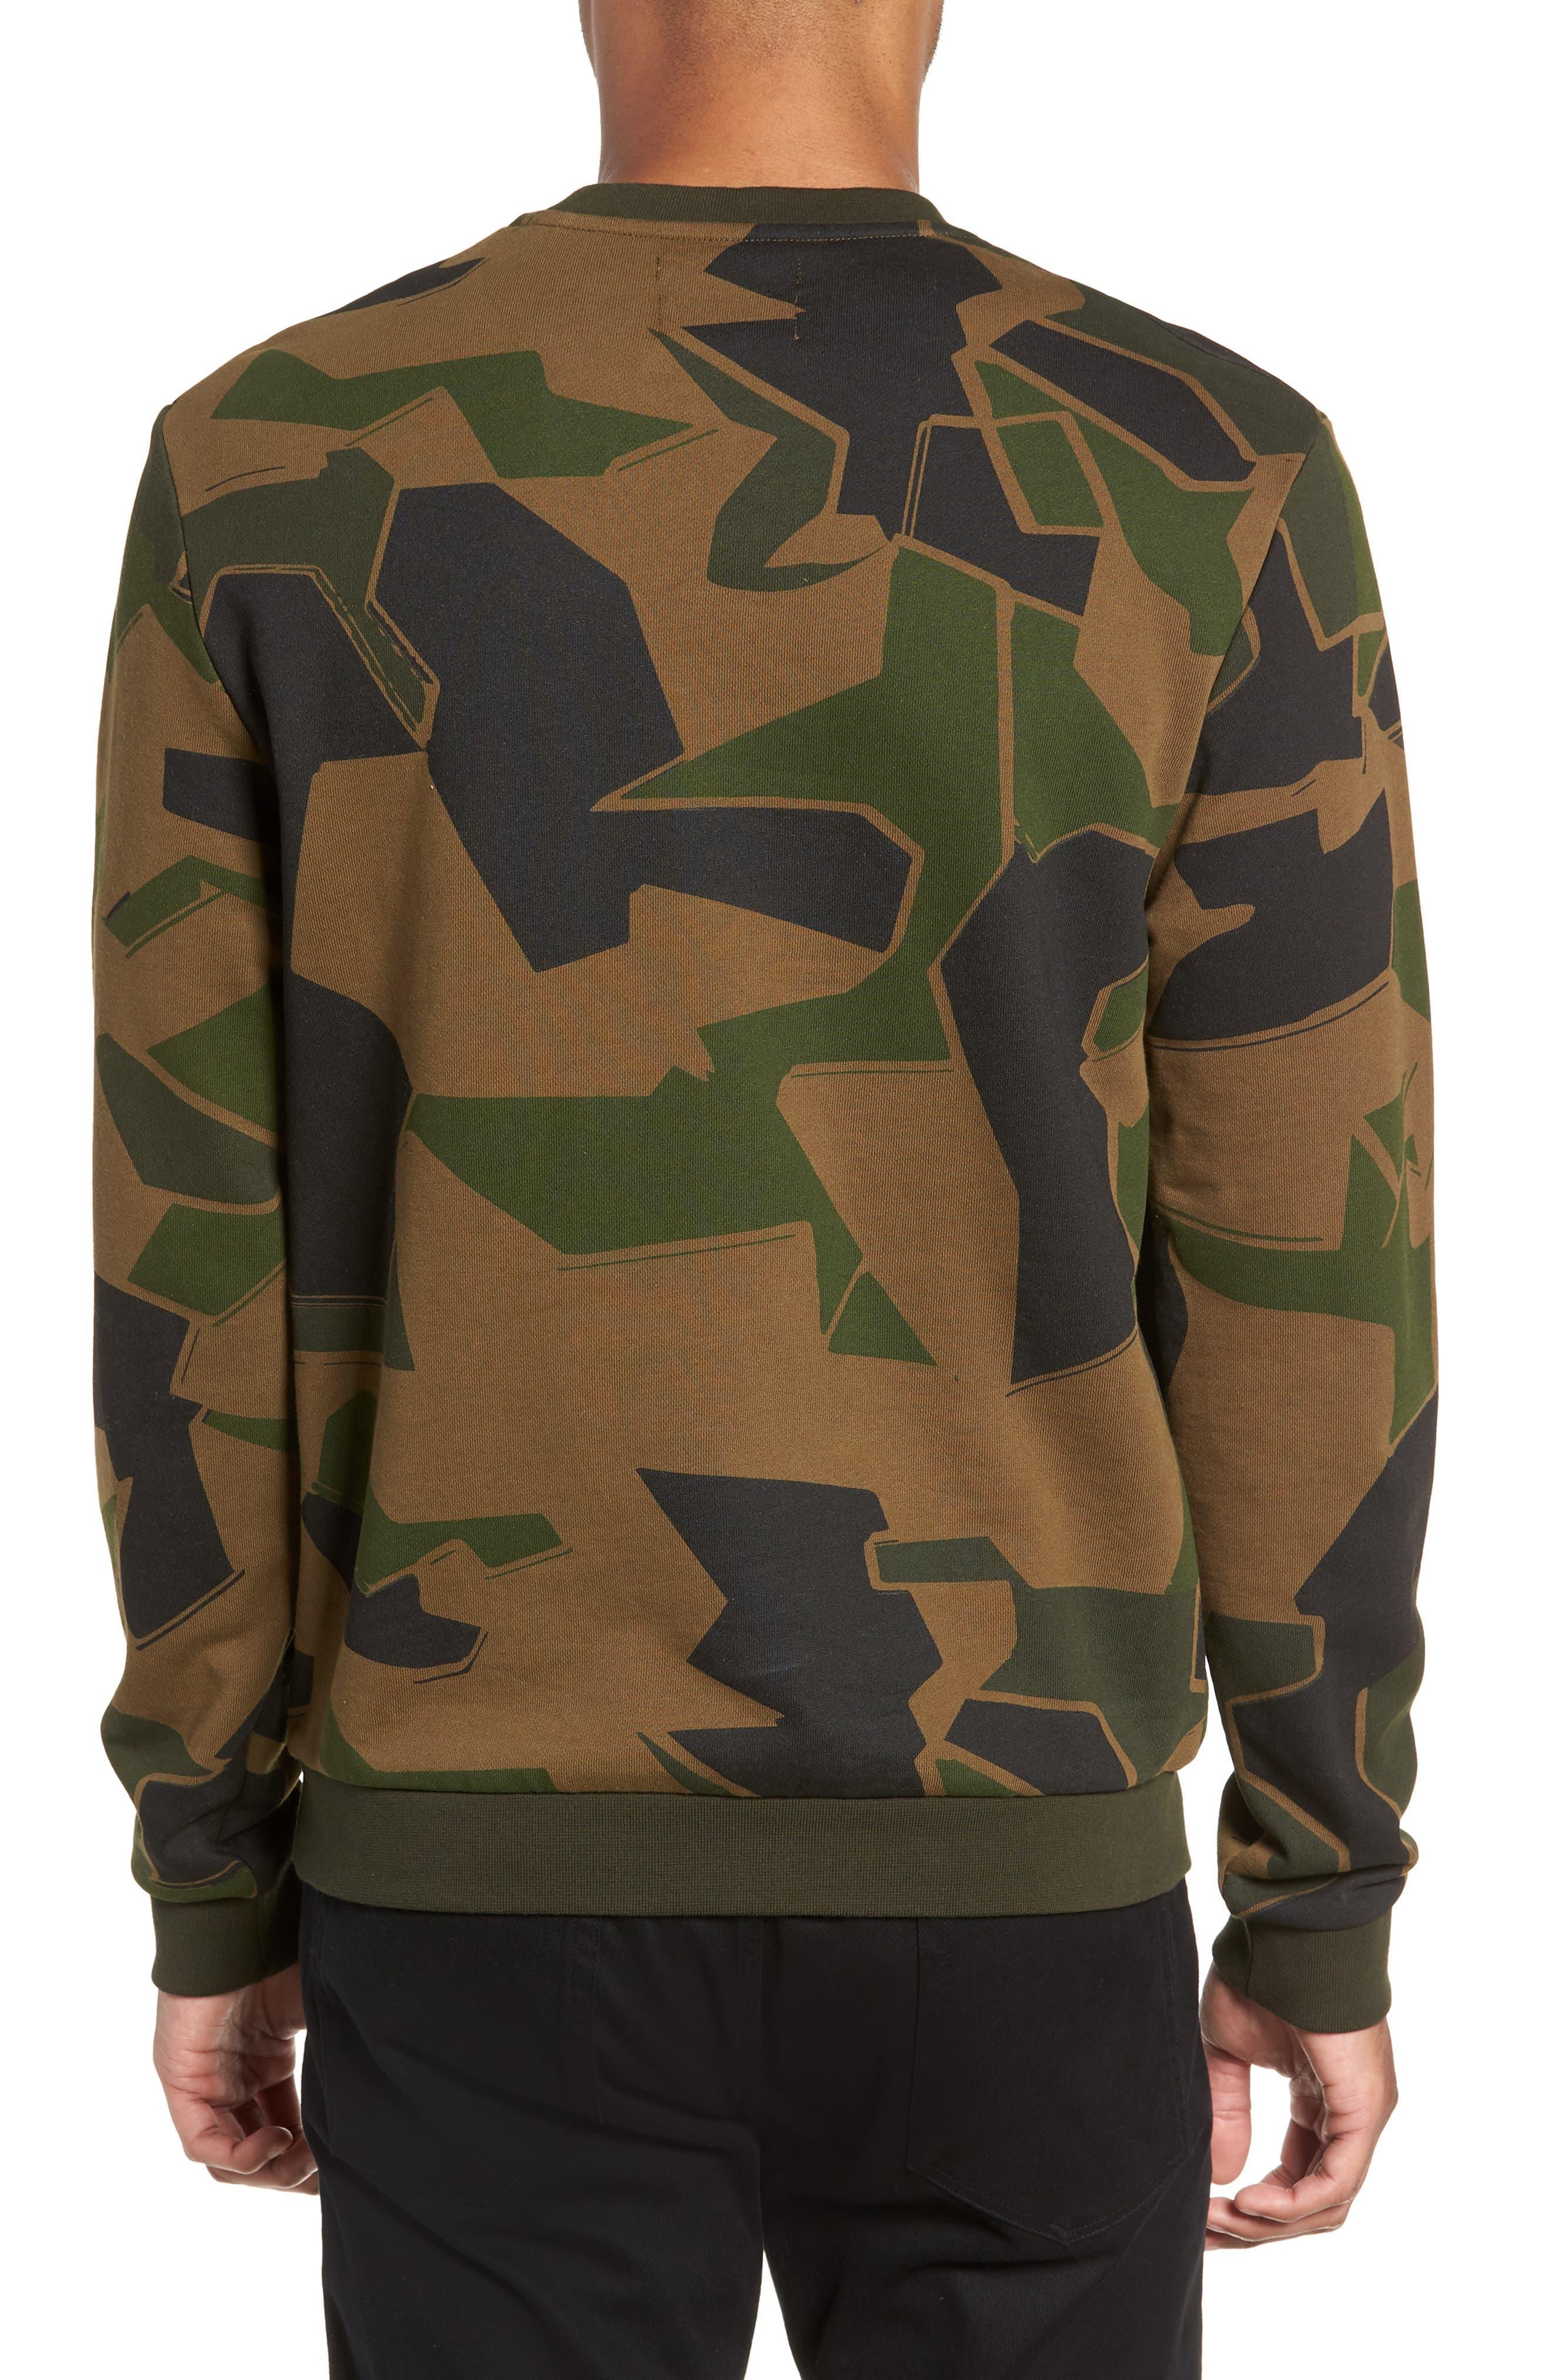 Camoflage Sweatshirt,                             Alternate thumbnail 2, color,                             WOODLAND CAMO